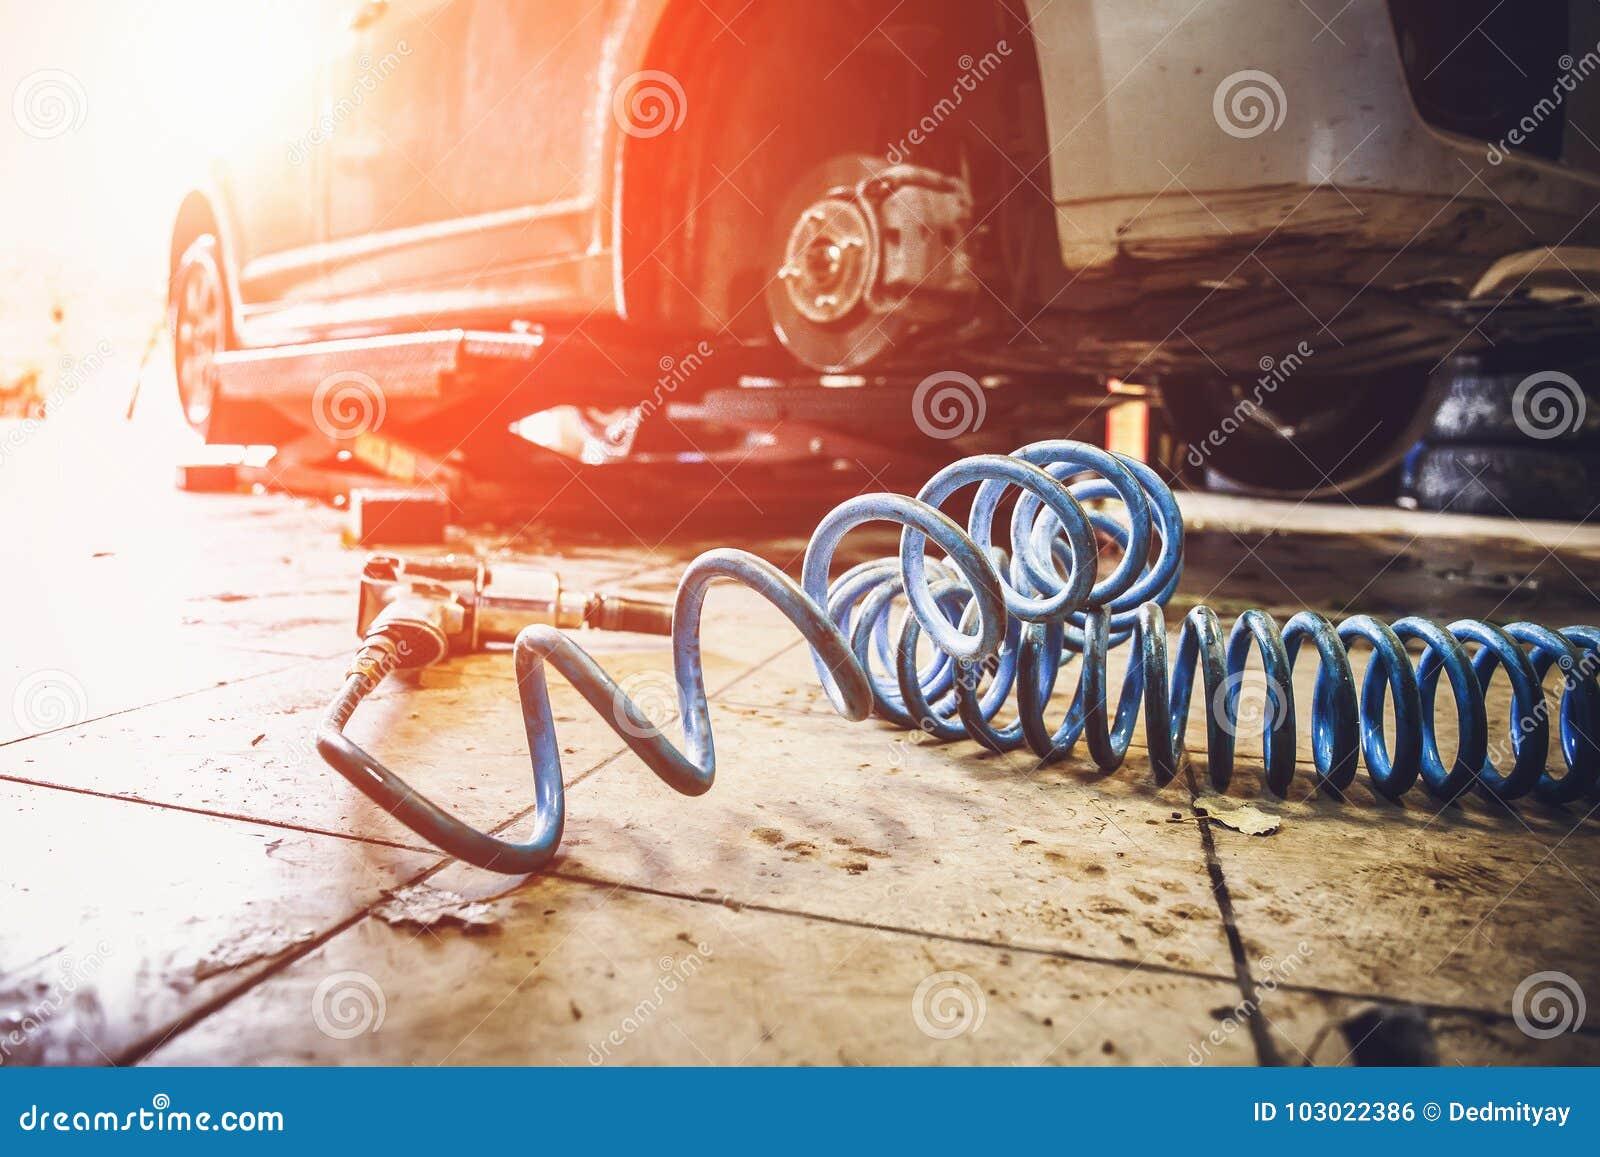 Car in garage in auto mechanic repair service work shop with special machine repairing equipment